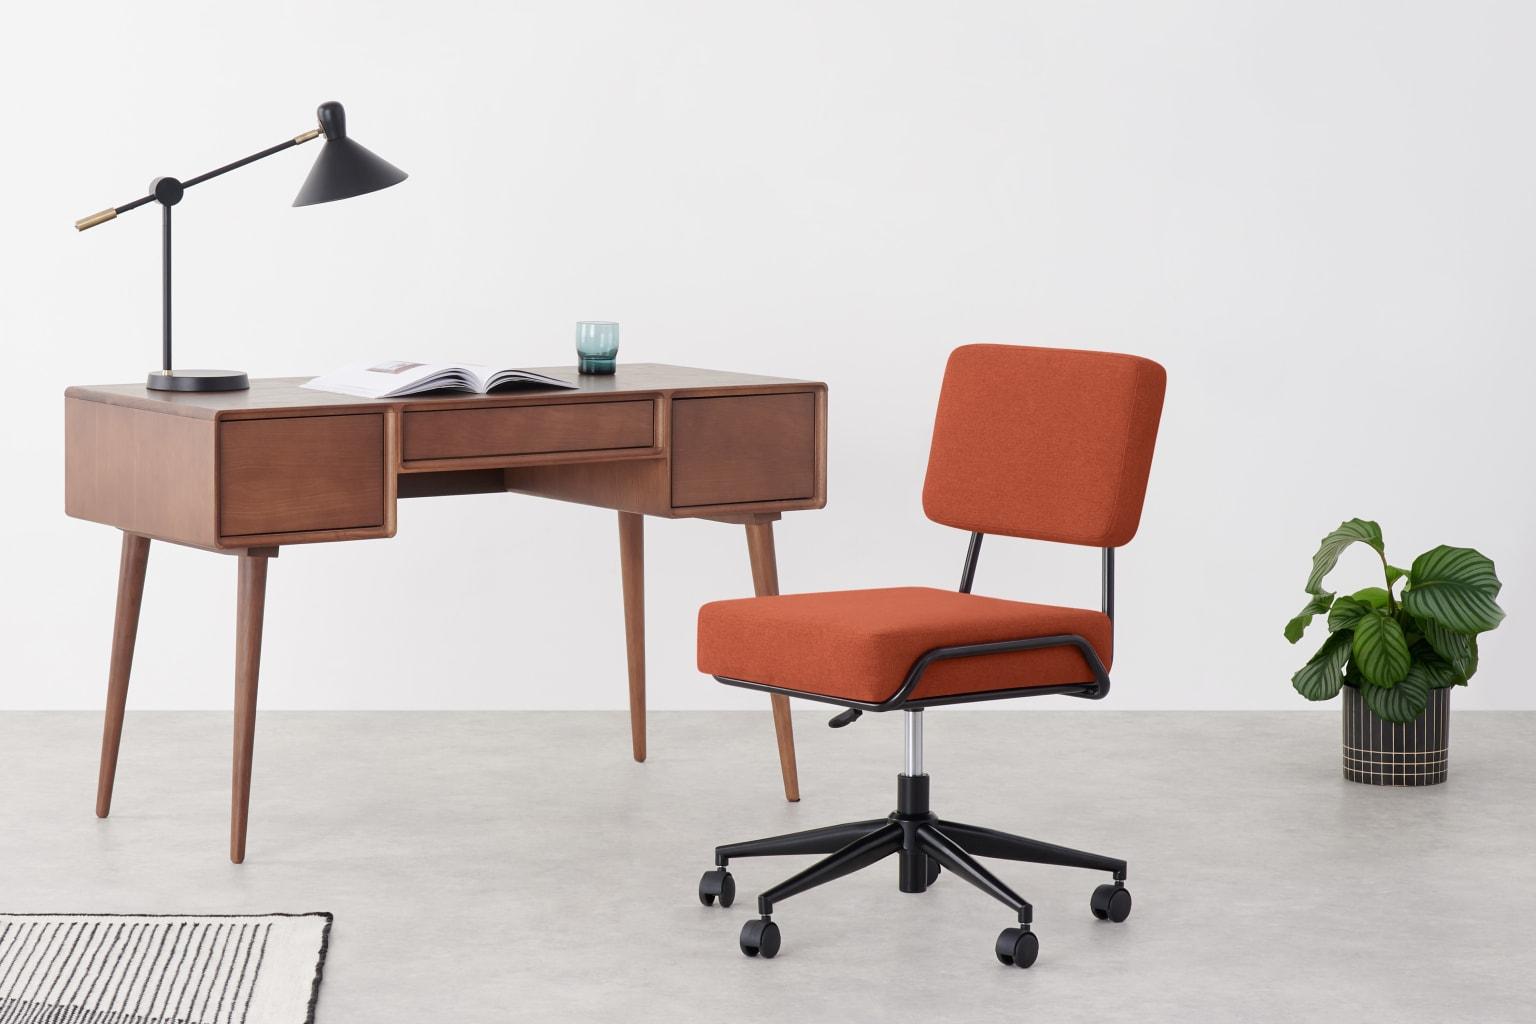 Silla de oficina naranja retro